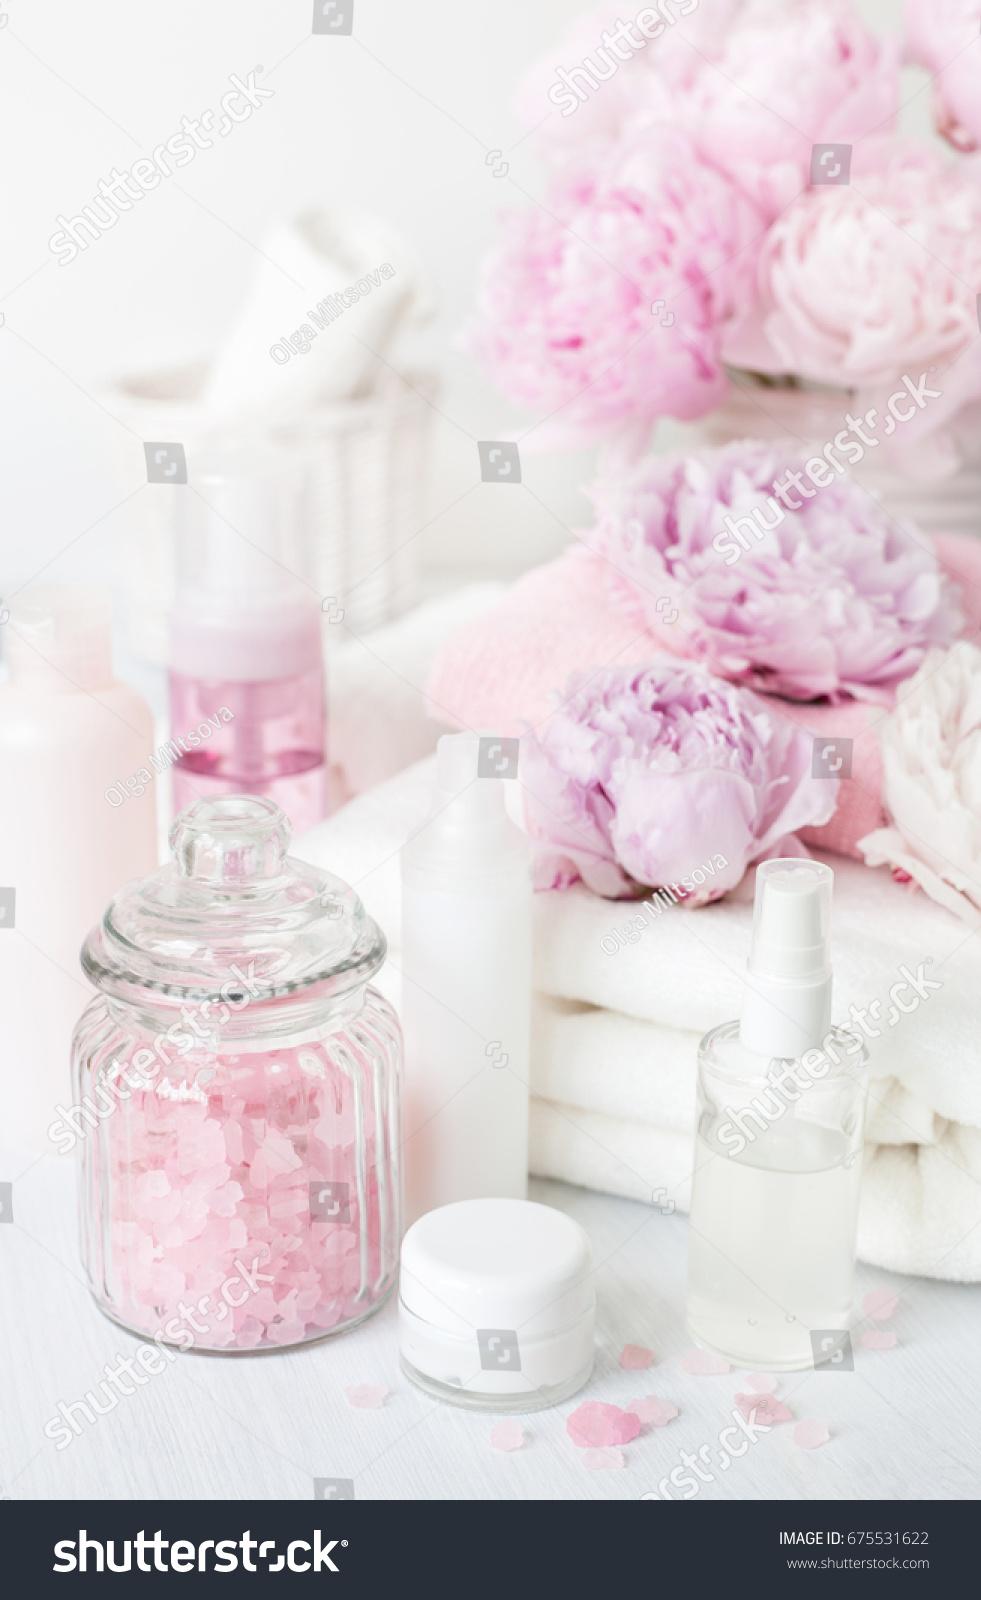 Bath Spa Peony Flowers Beauty Products Stock Photo Edit Now